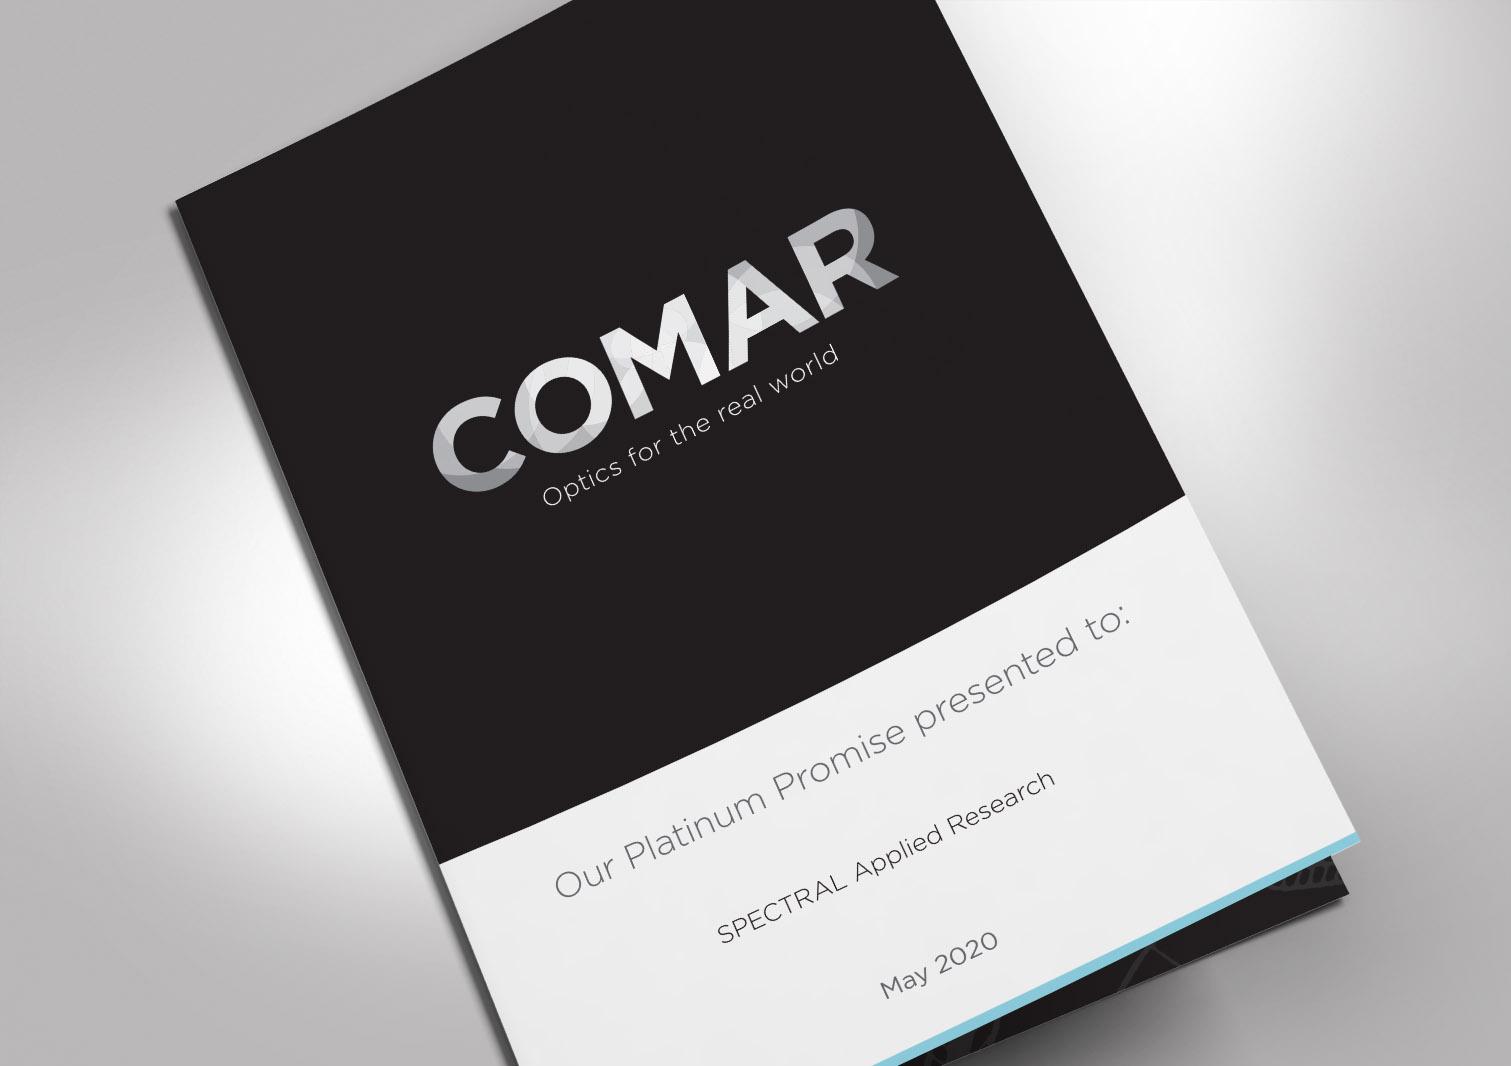 Comar Optics Limited - Platinum Promise - Proposal Cover